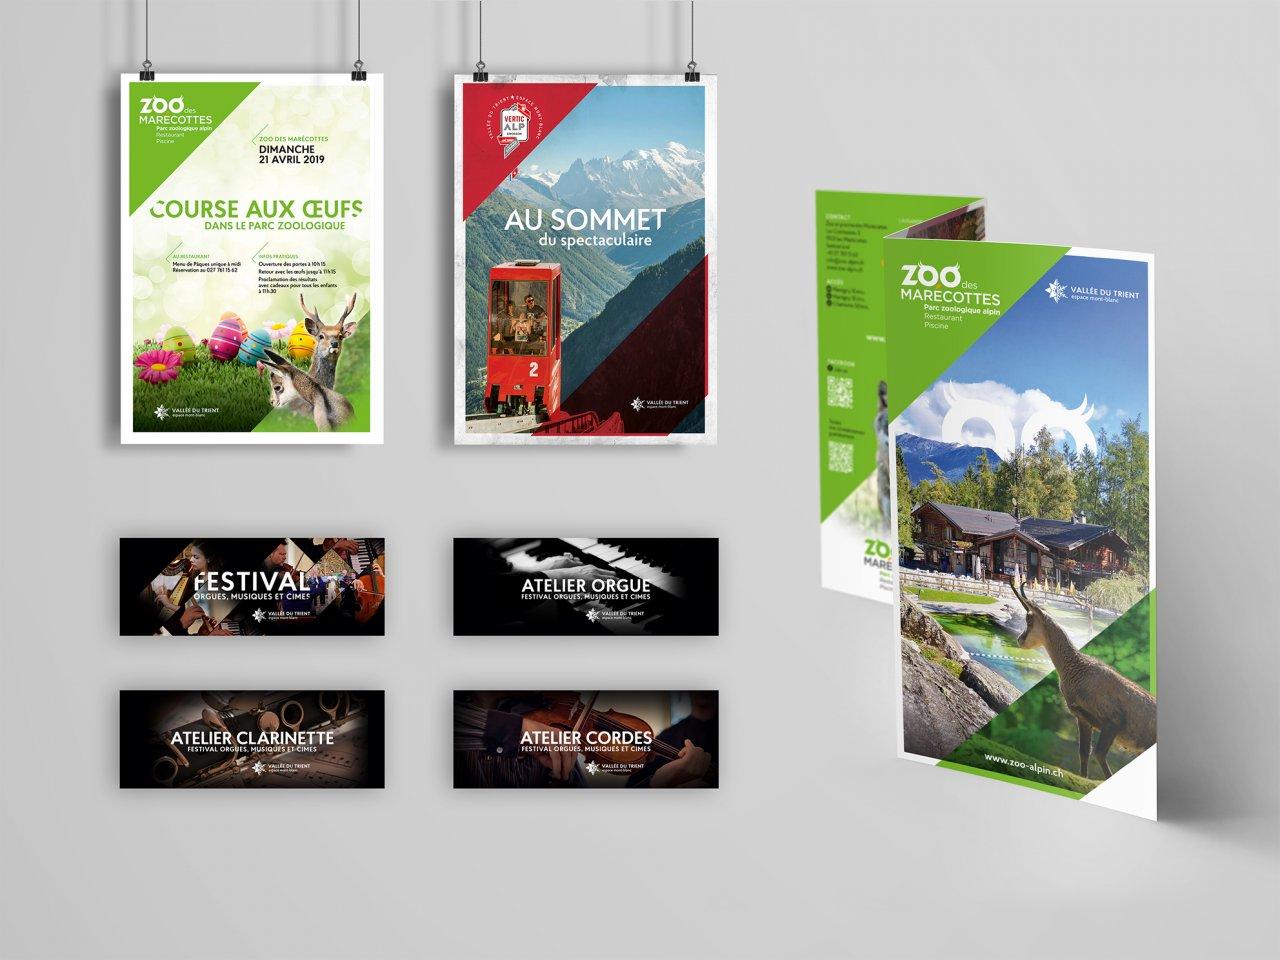 Atelier graphique IGN SA